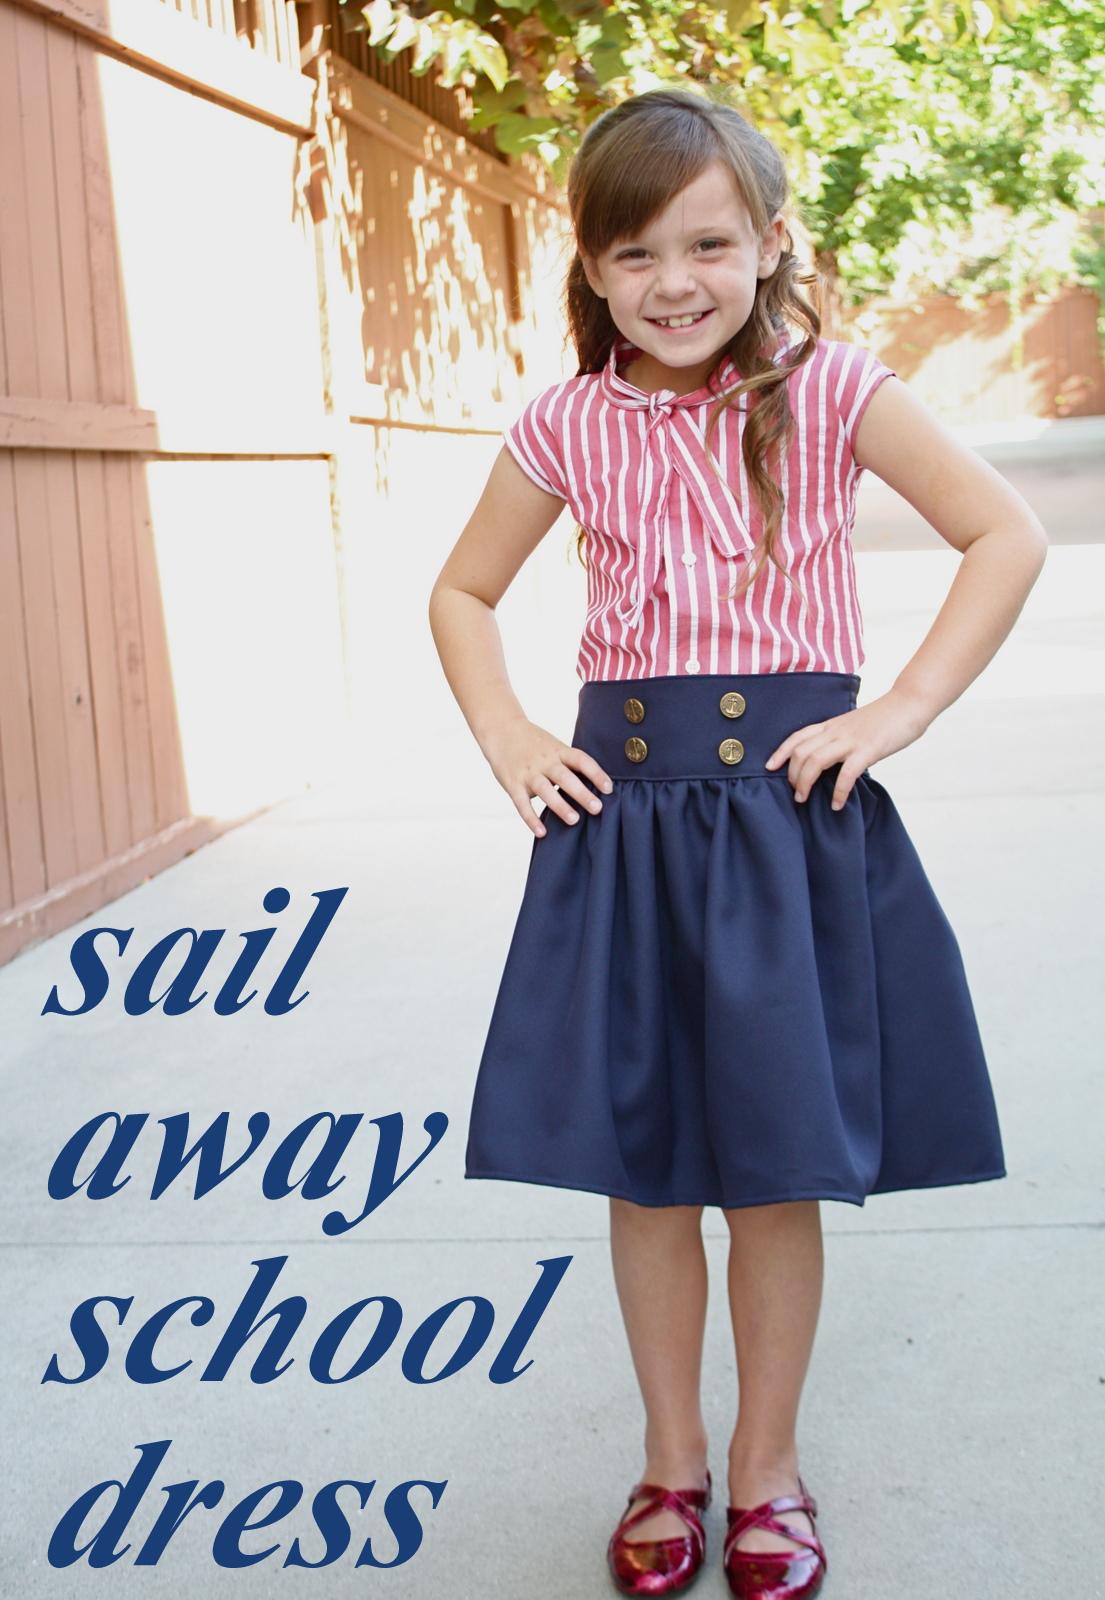 At second street sail away school dress tutorial sail away school dress tutorial jeuxipadfo Images